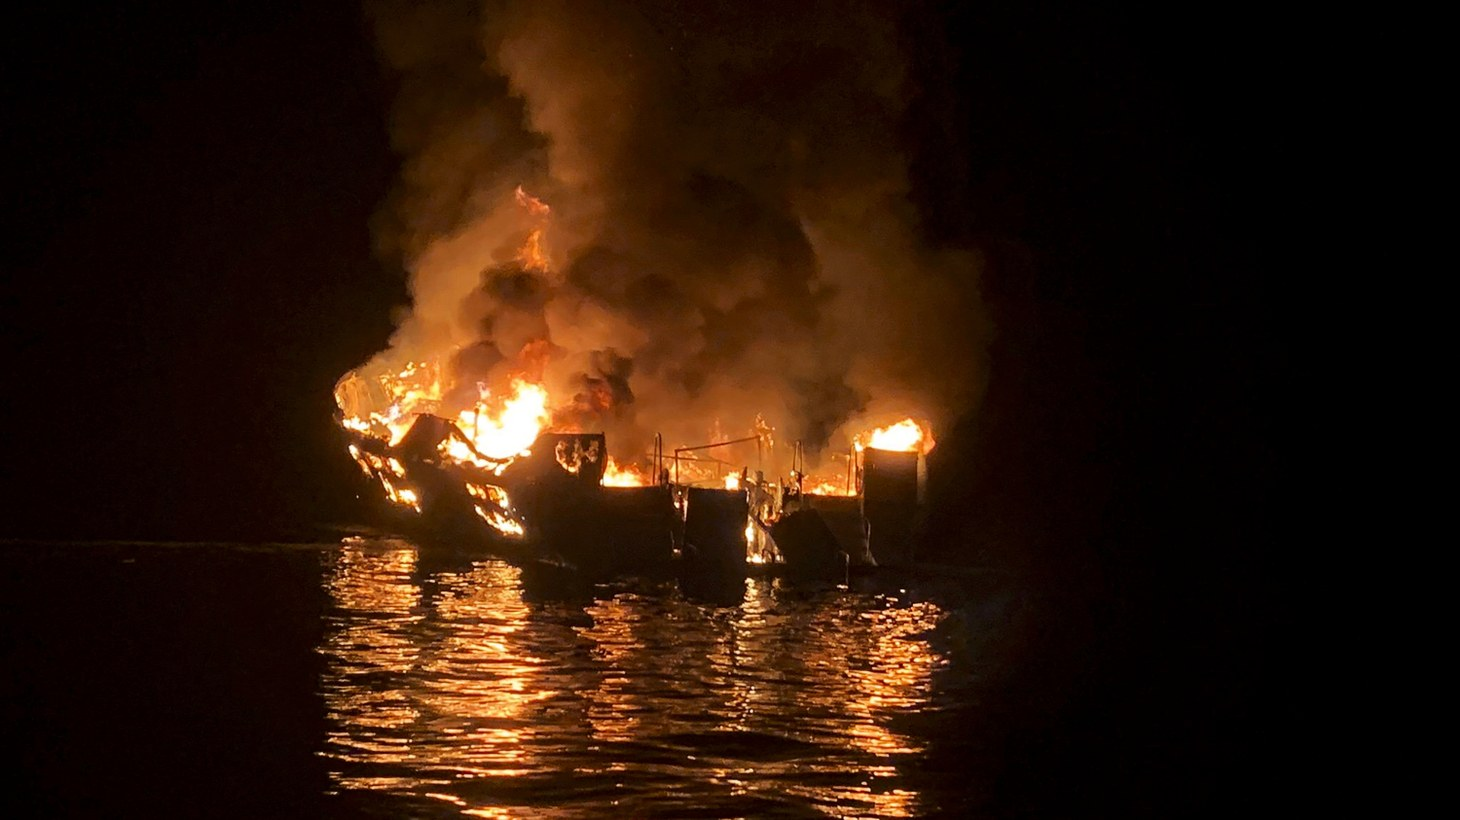 The diving boat MV Conception burns off the coast of Santa Cruz island, California.